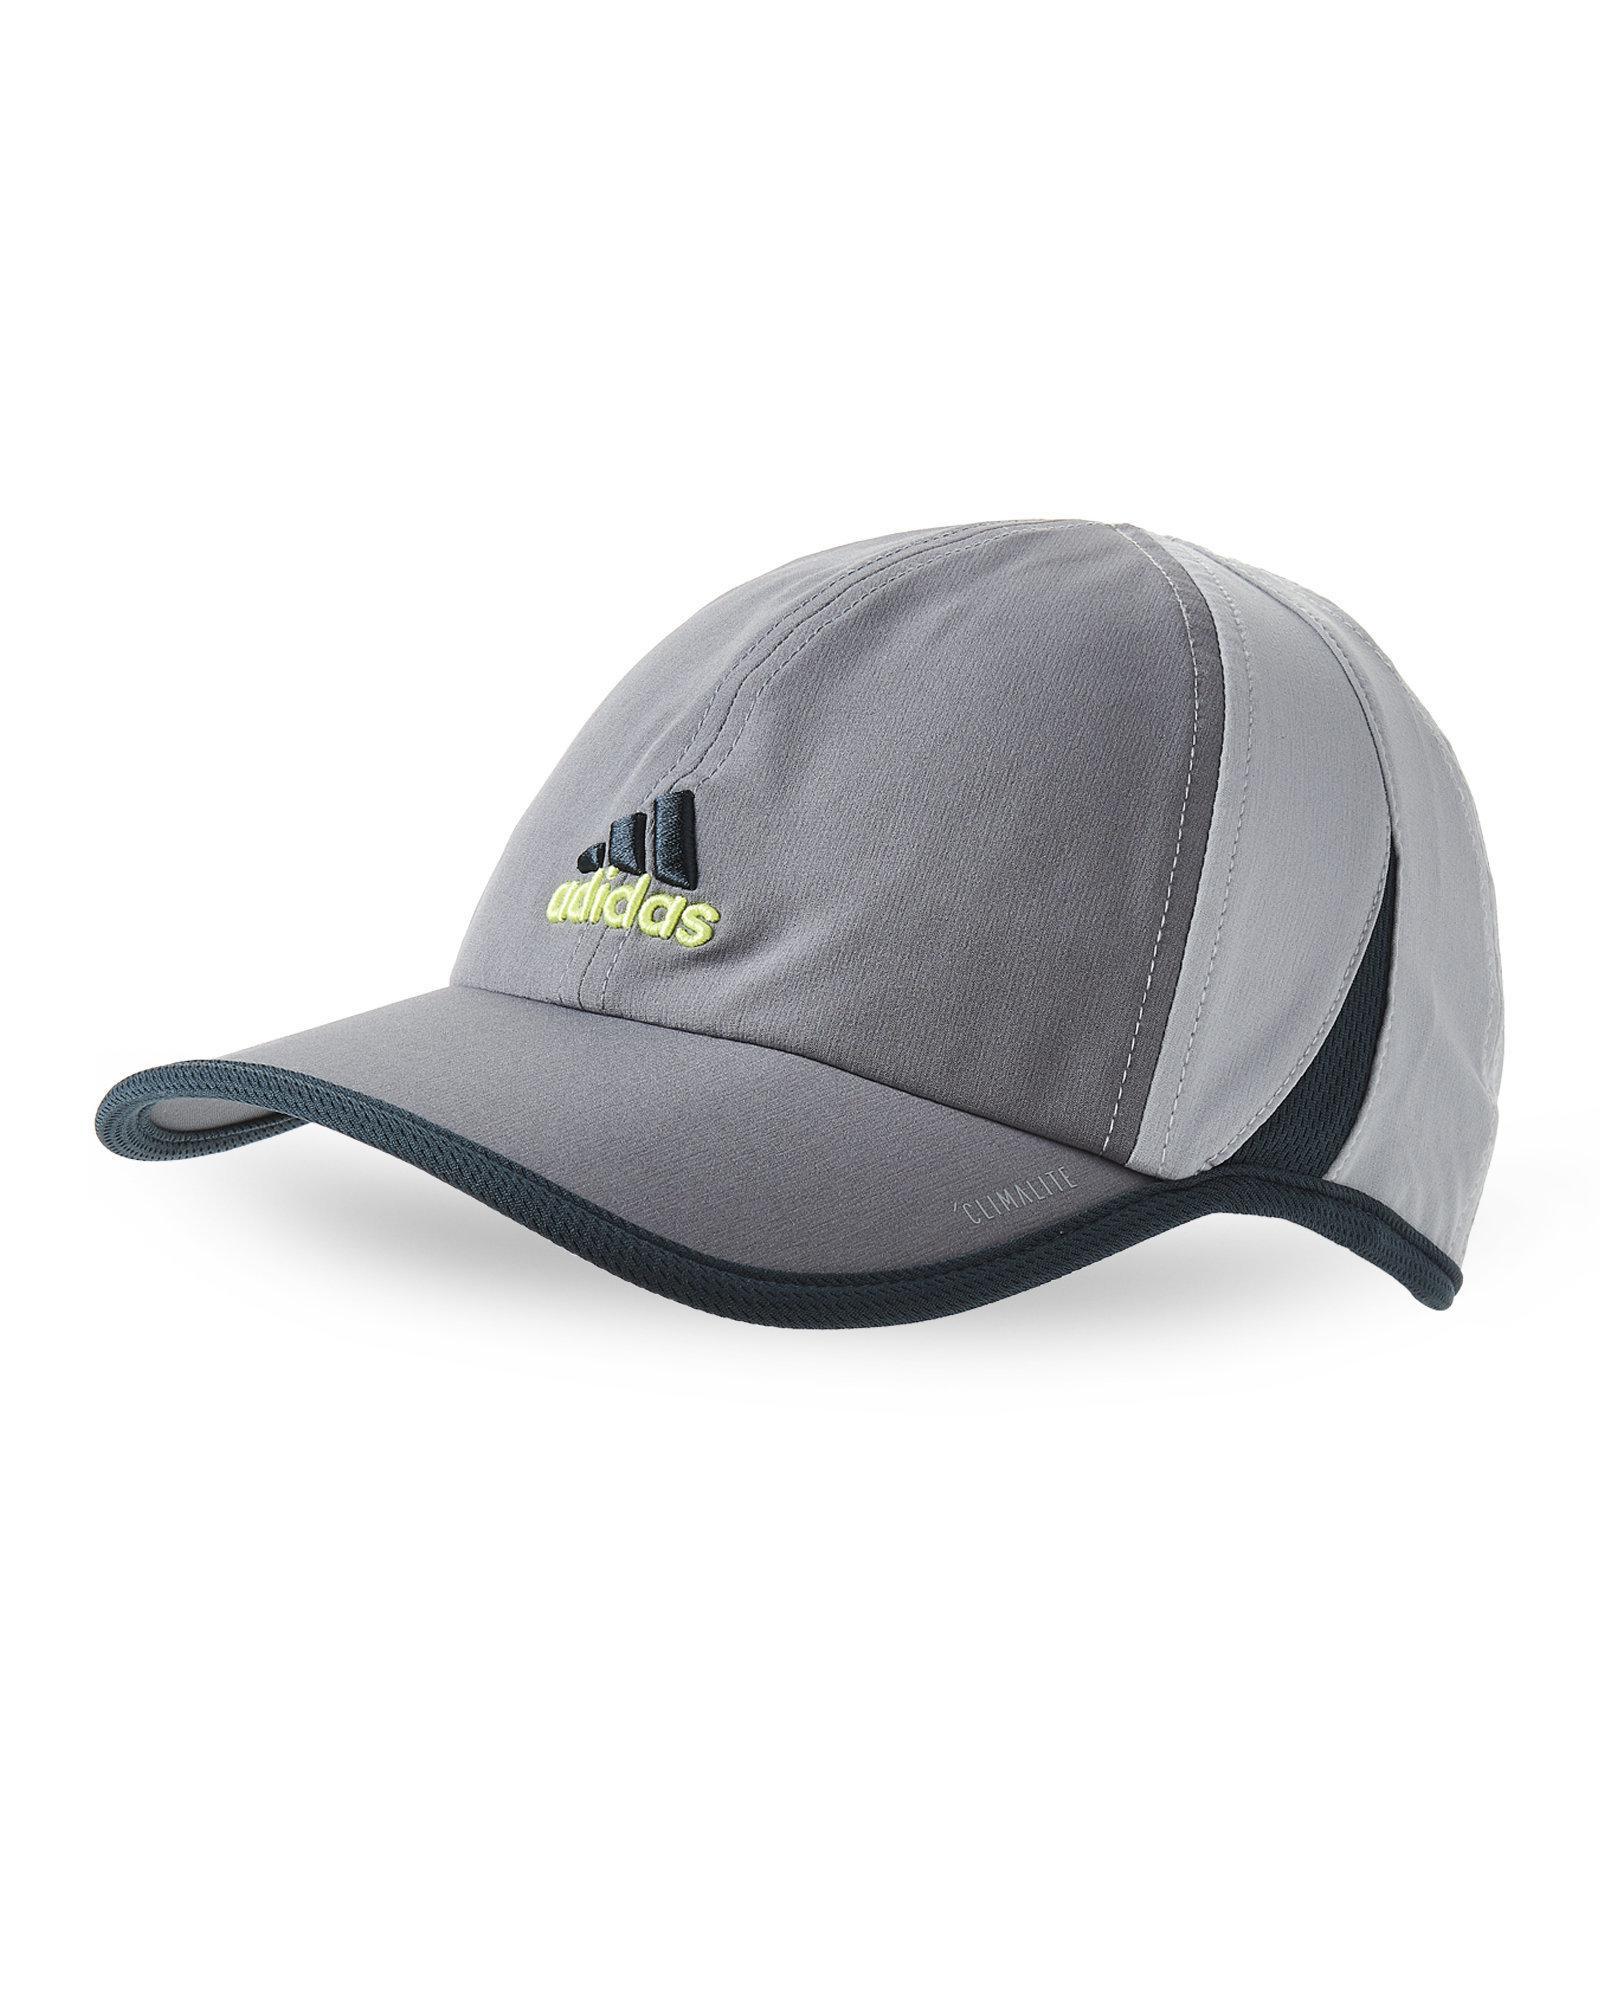 32f7404cac71 Adidas - Gray Superlite Baseball Cap for Men - Lyst. View fullscreen